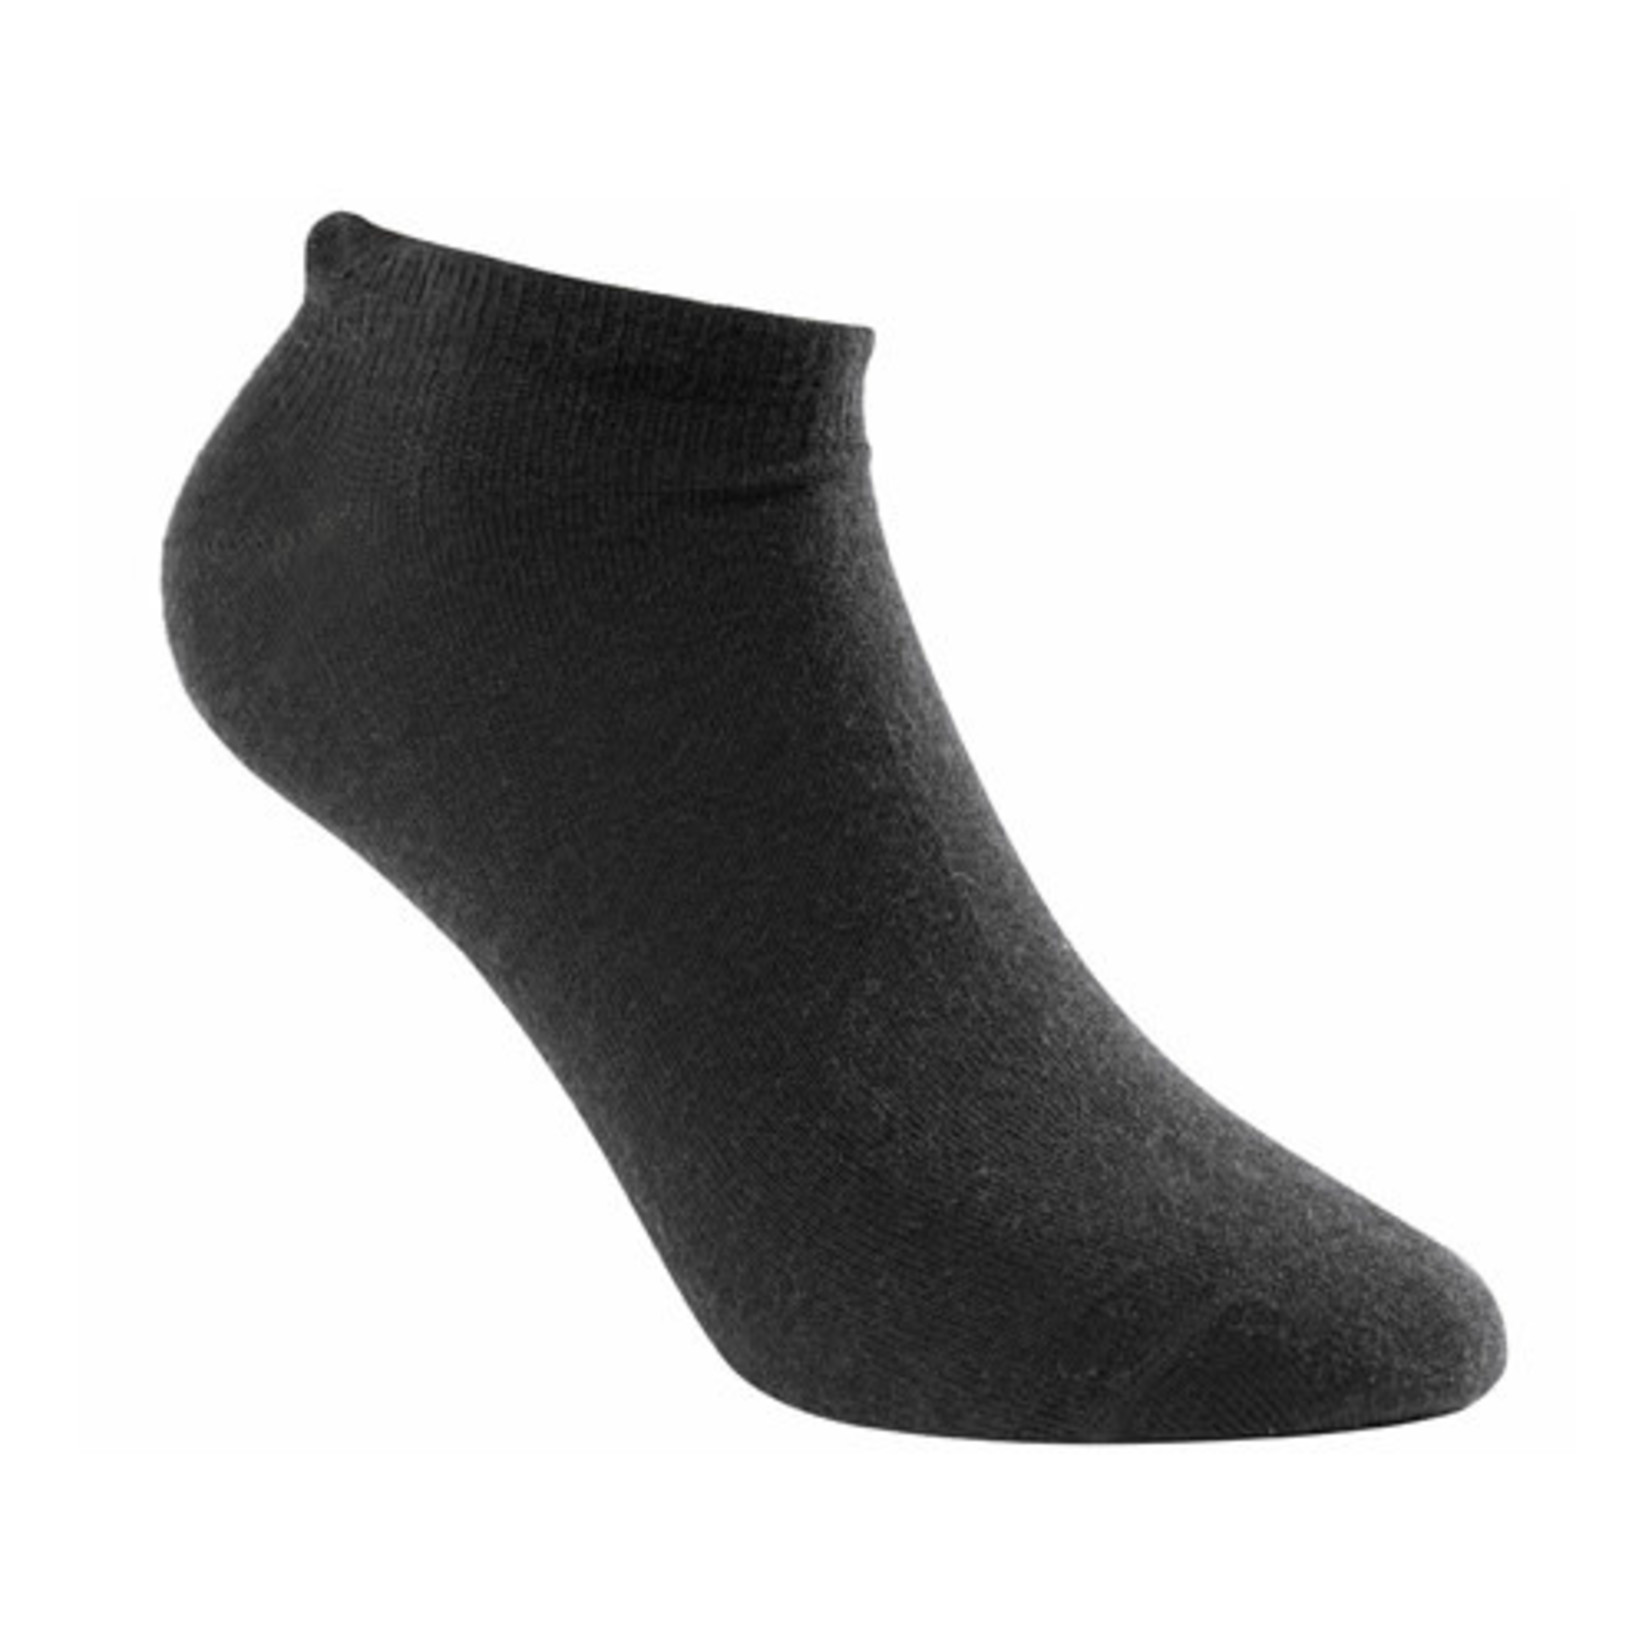 Woolpower Ankle Sock Liners